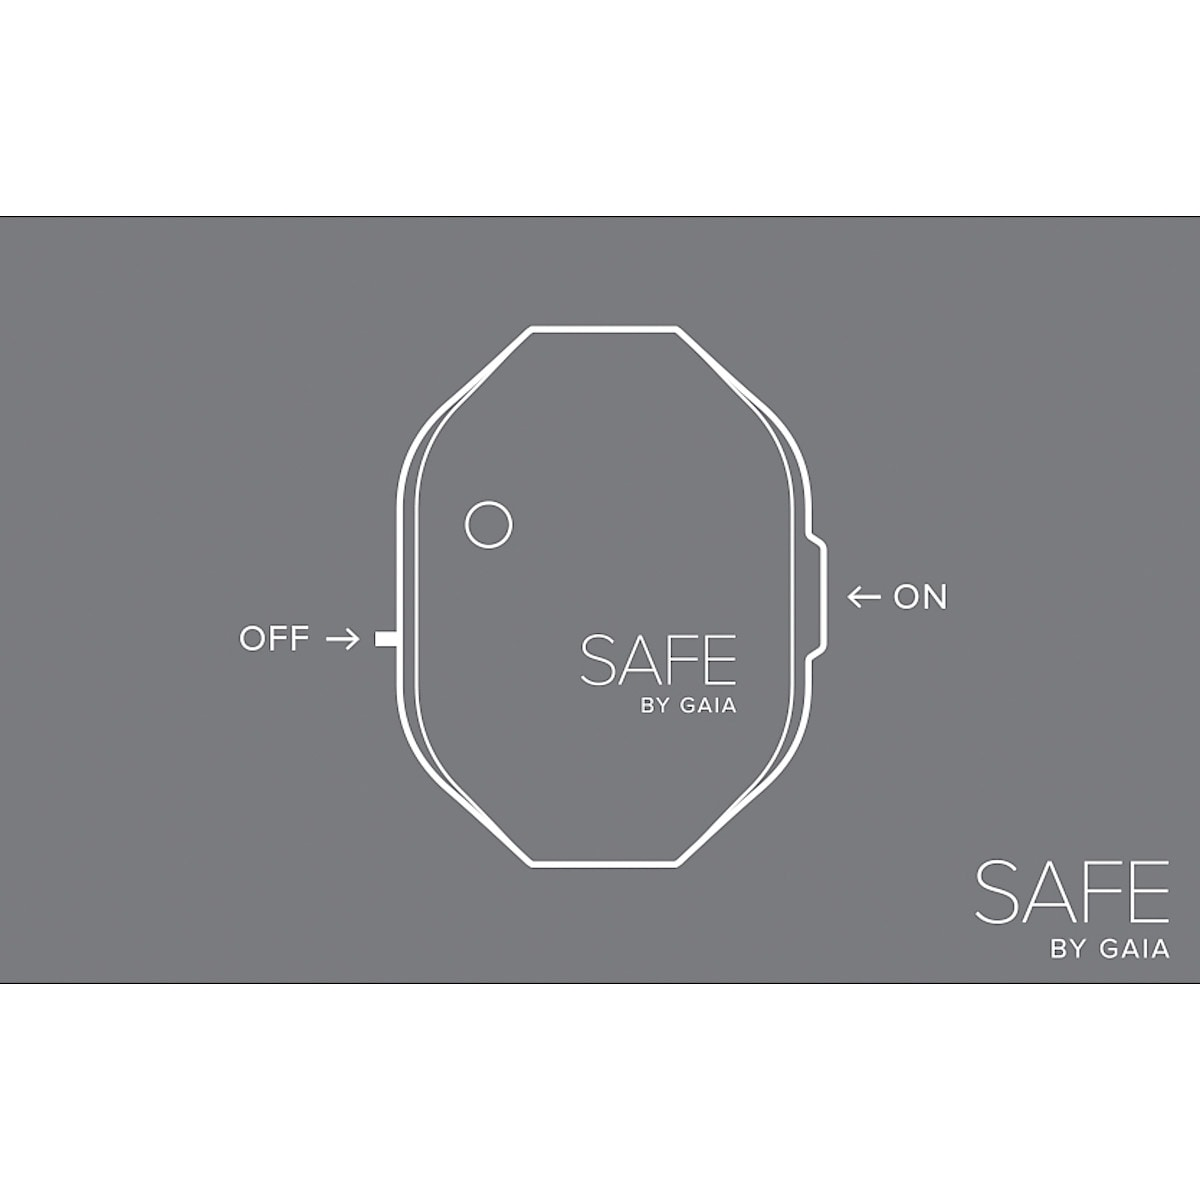 Armband mit Überfallalarm, Safe by Gaia